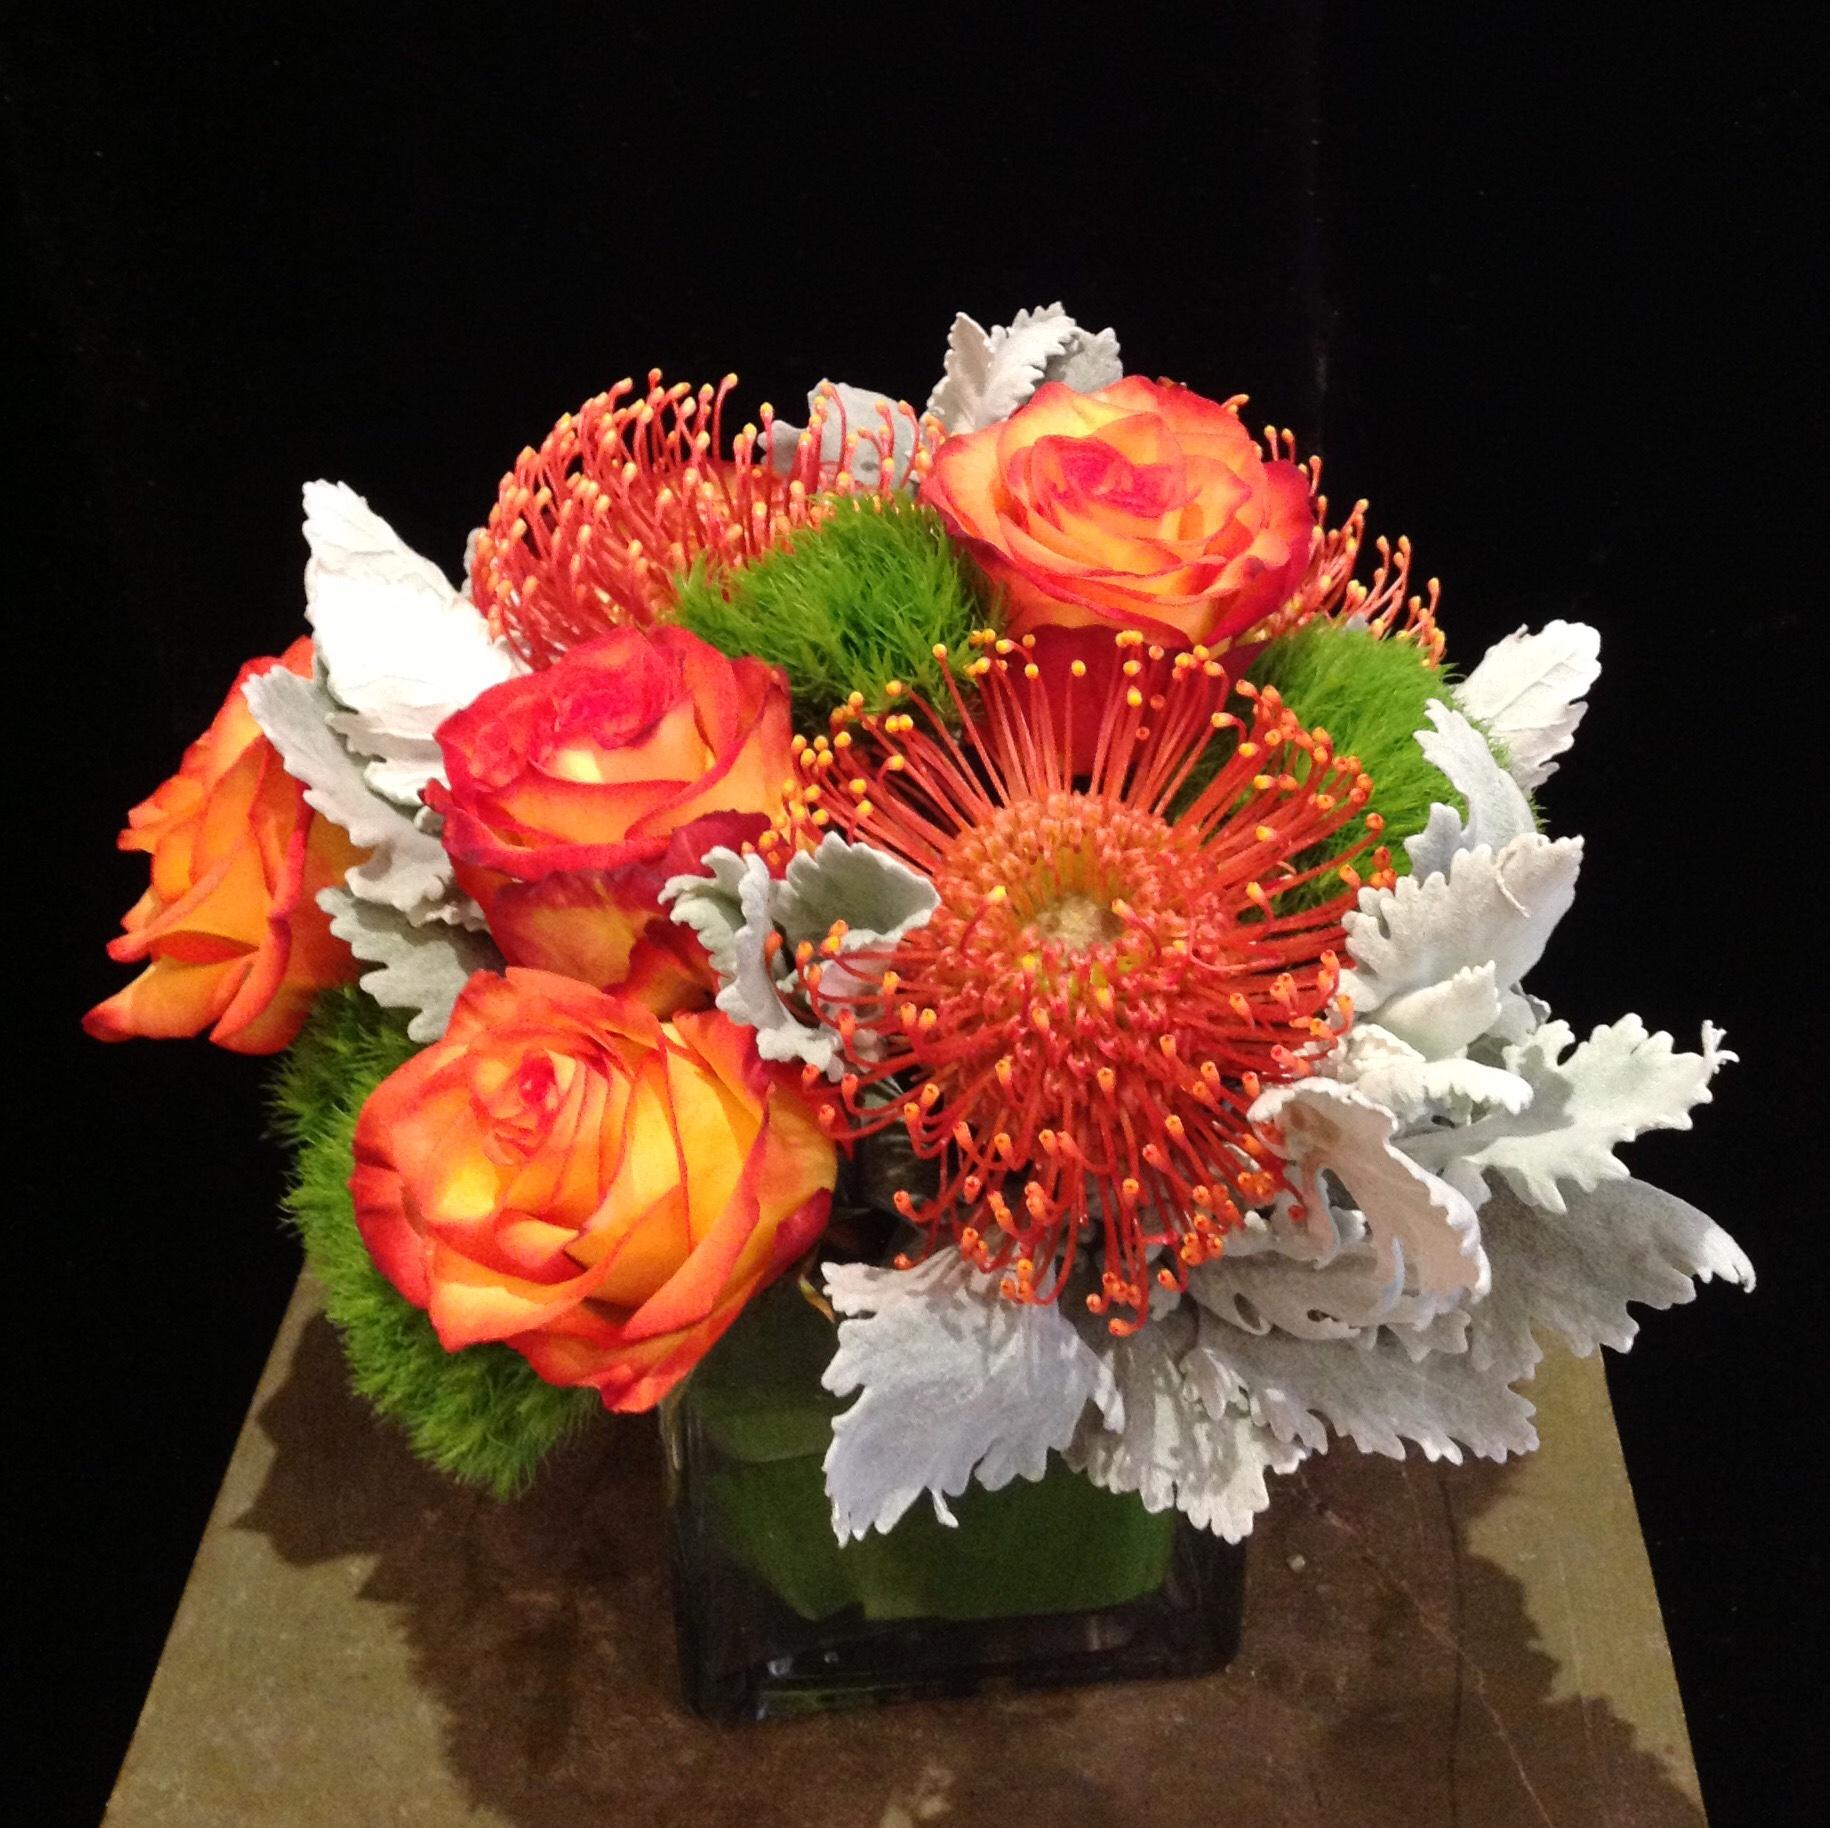 Half a Dozen 'High & Magic Roses, Orange Pincushion, Dianthus & Dusty Miller